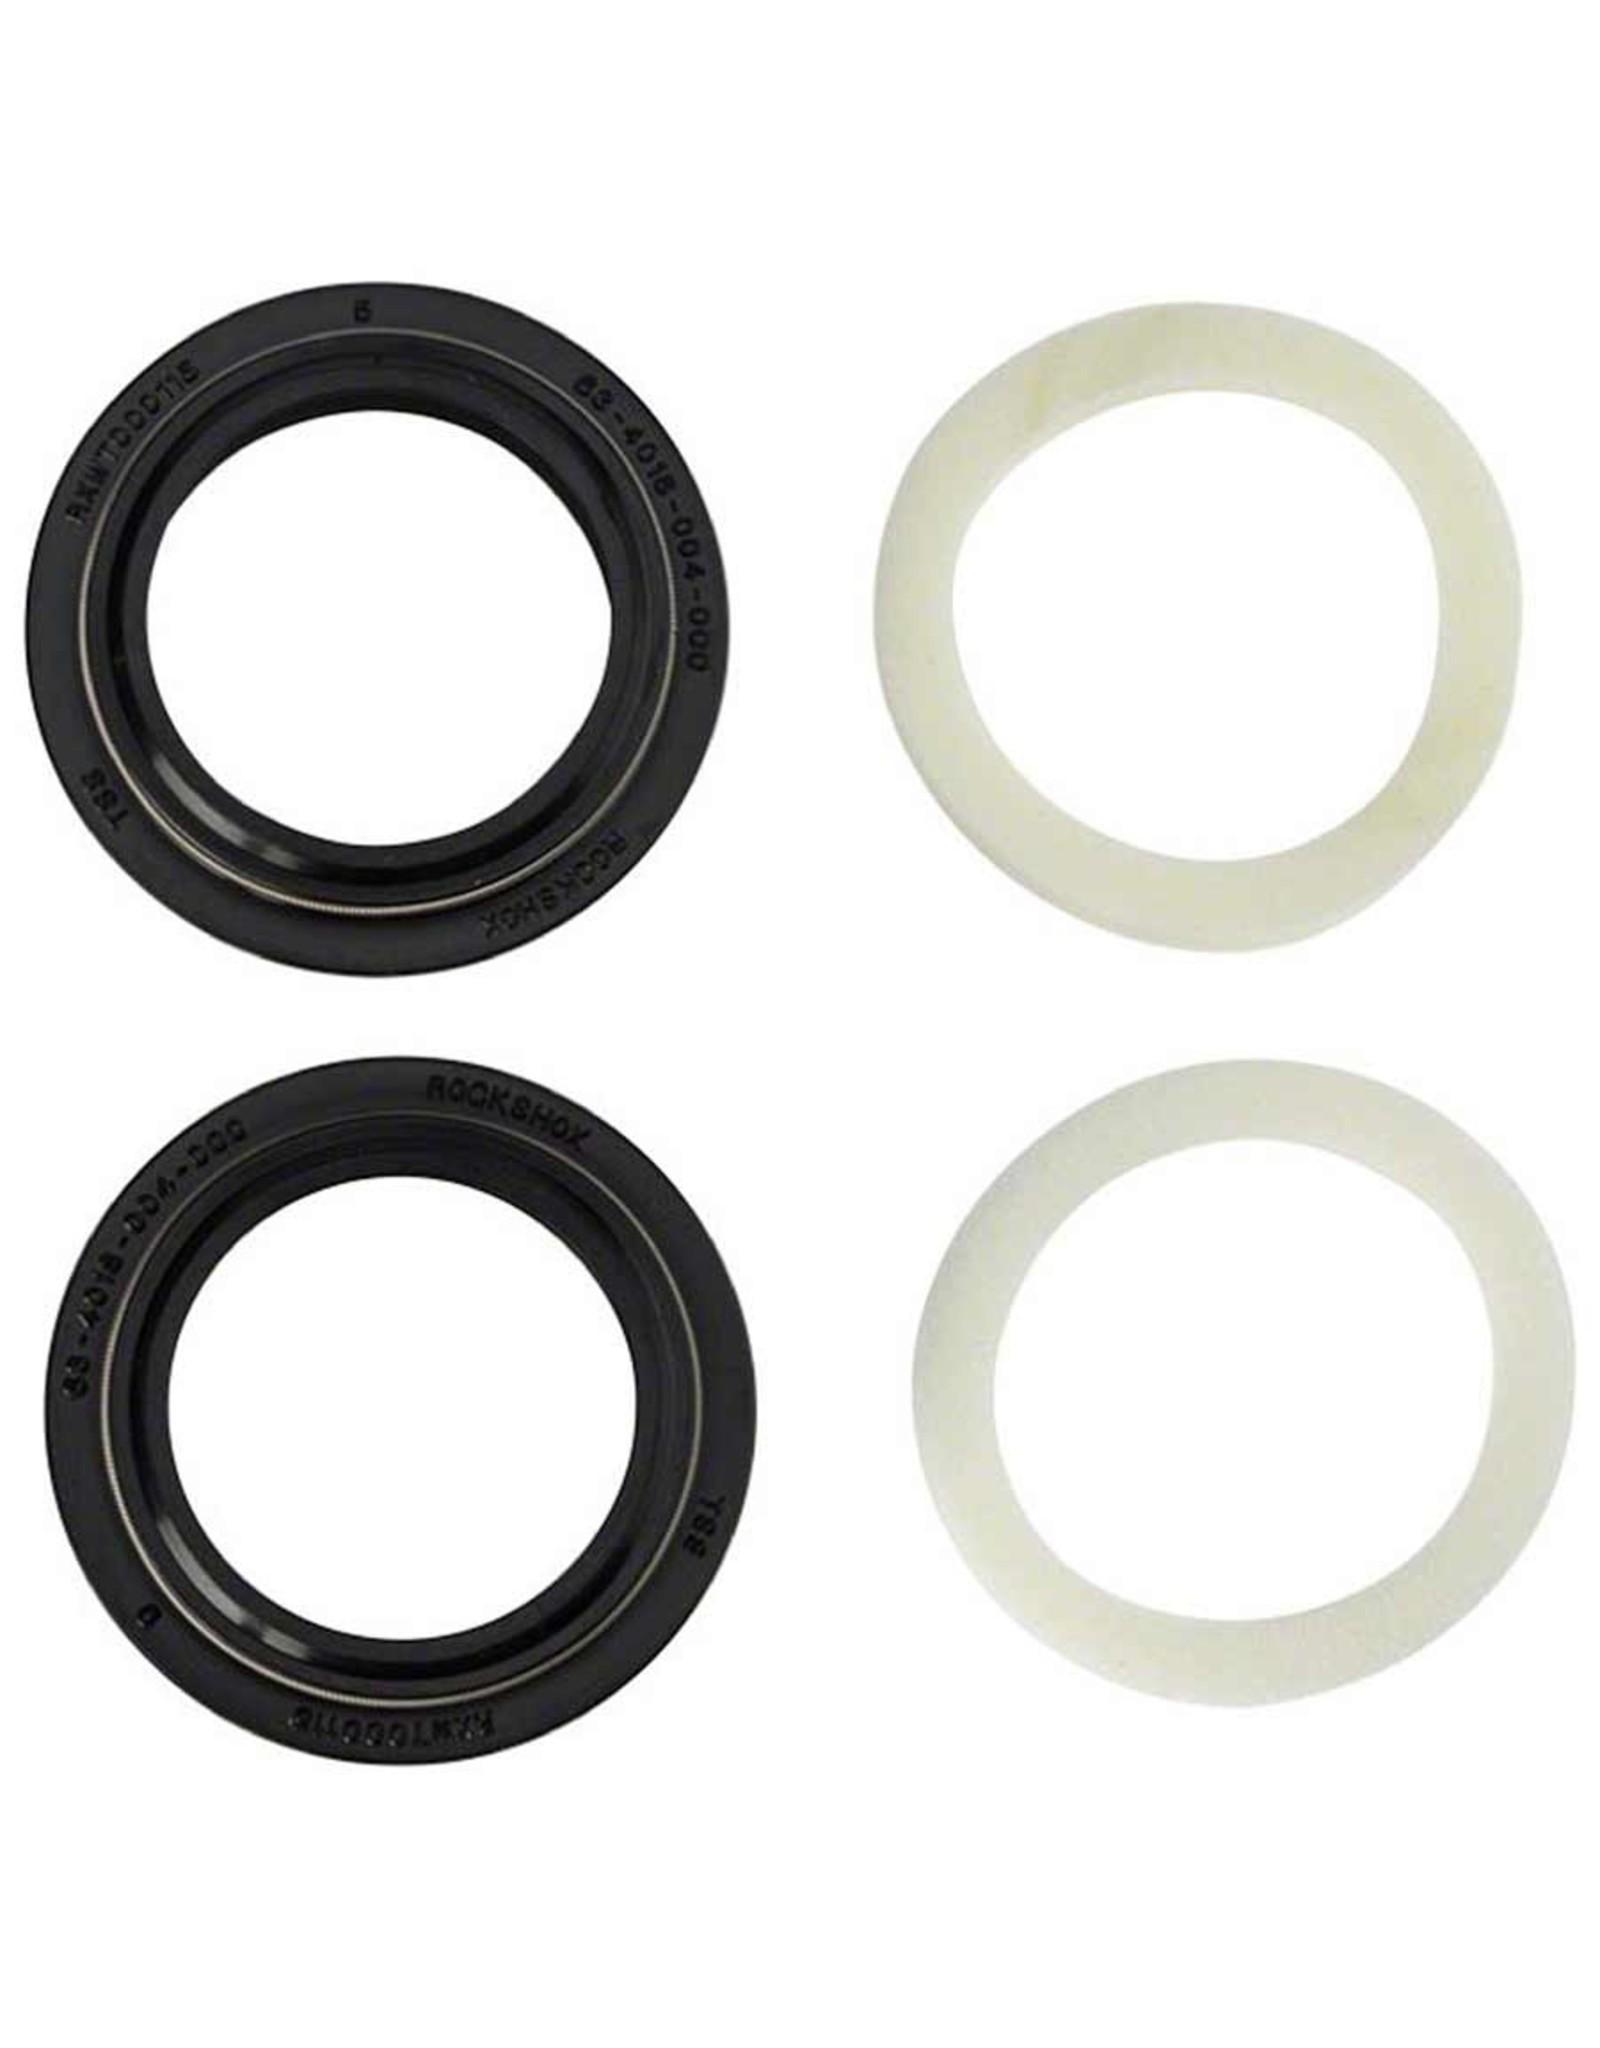 RockShox, 11.4018.028.001, Dust seal with foam ring, 32mm/ 5mm SID A1-A3 /Reba A2-A3